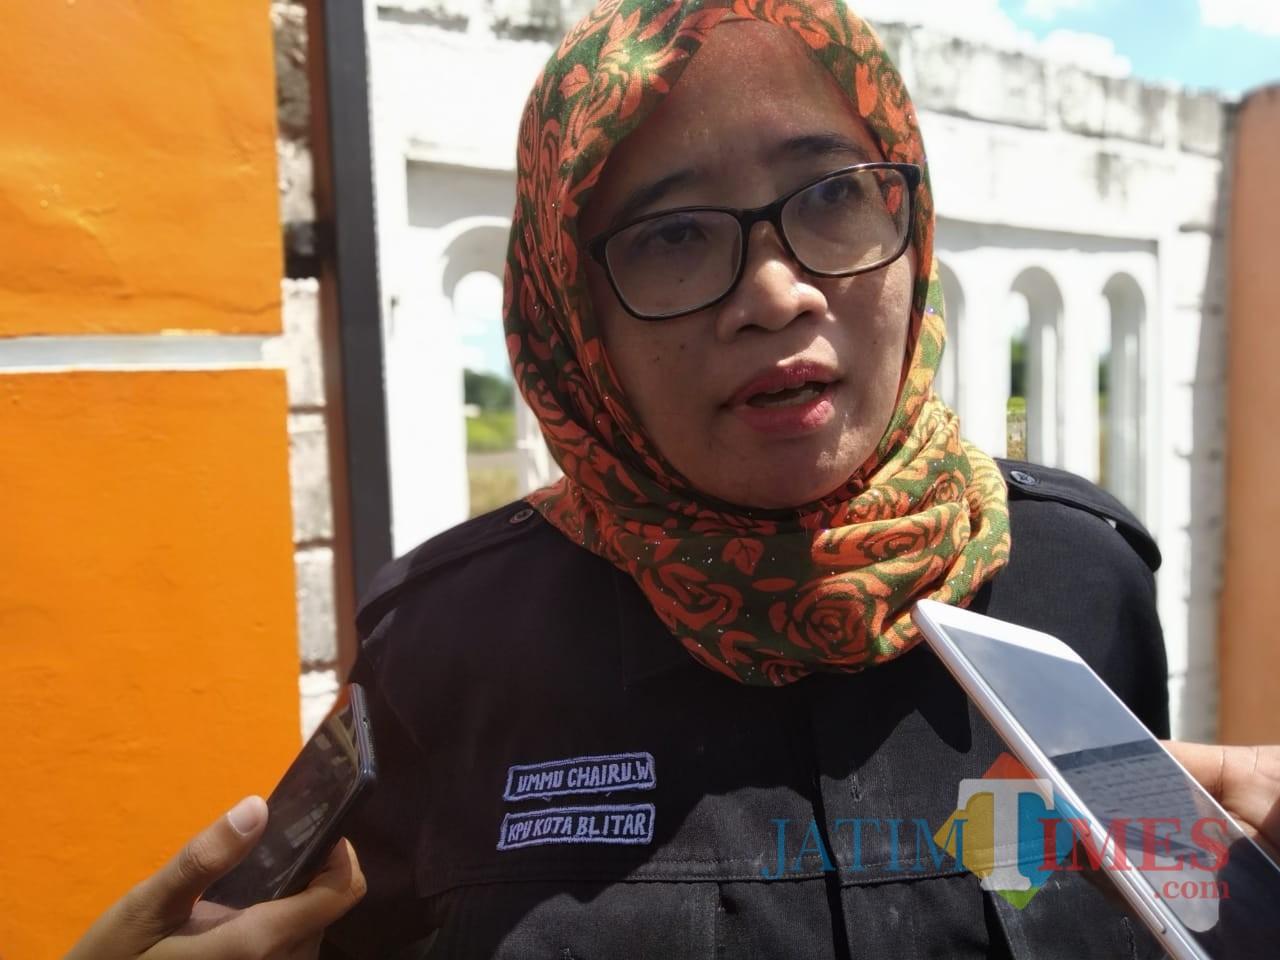 Komisioner Divisi Partisipasi Masyarakat KPU Kota Blitar, Ummu Chairu Wardhani